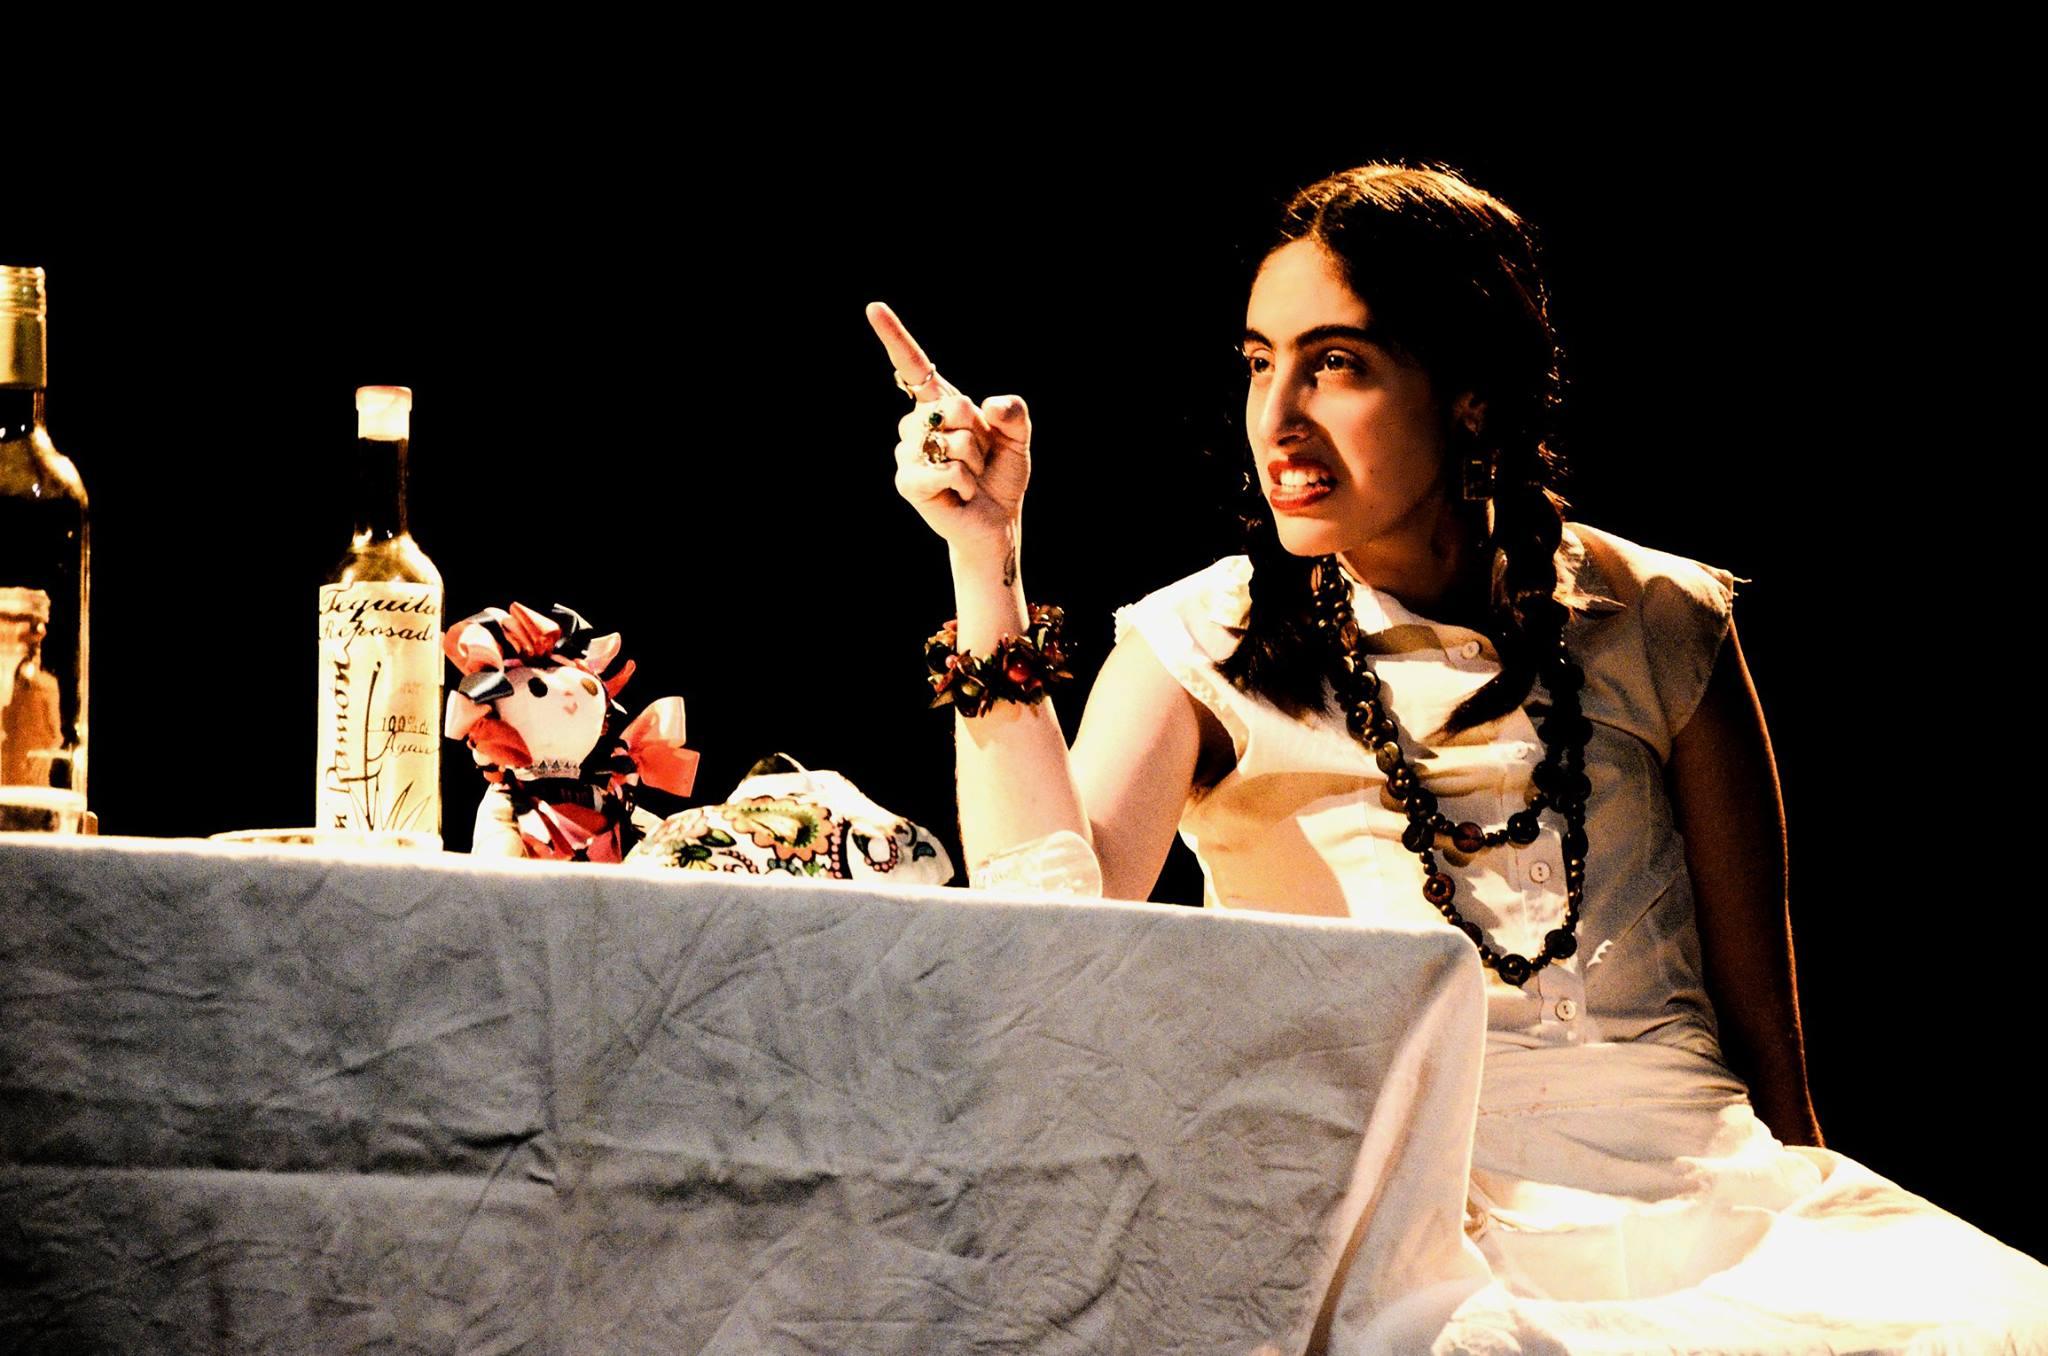 Frida Khalo viva la vida4